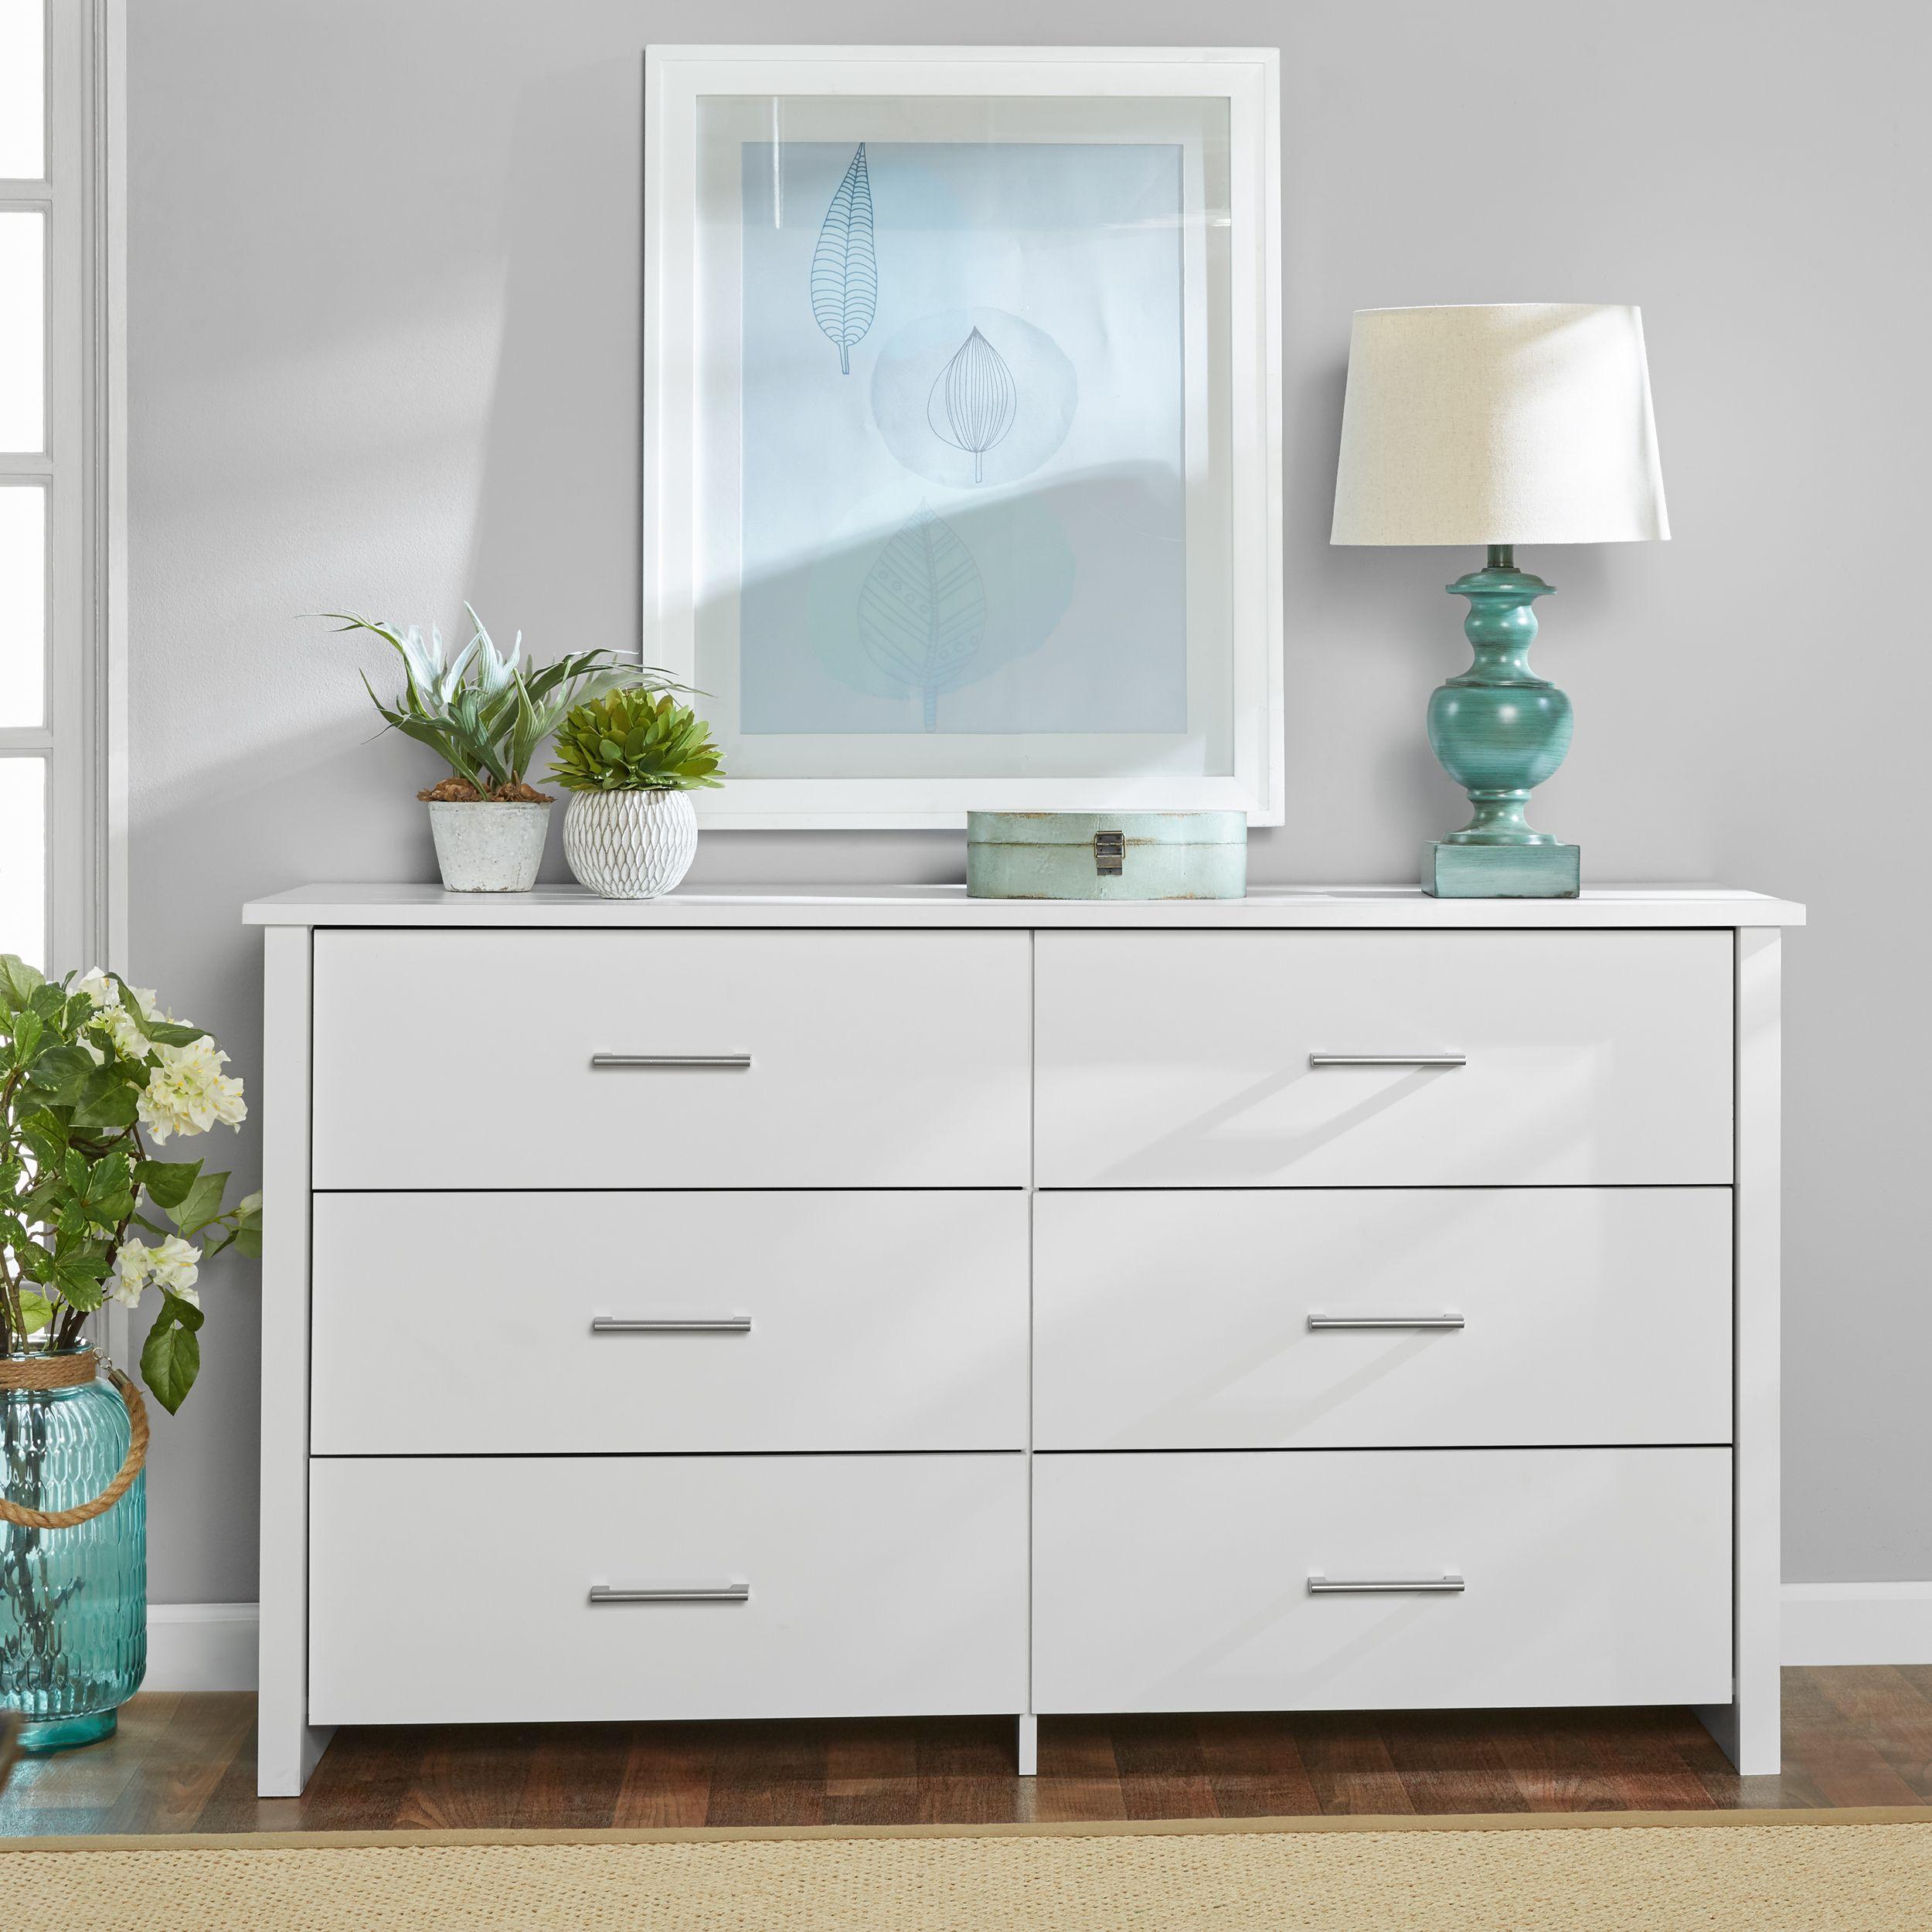 Mainstays Hillside 6 Drawer Dresser Soft White Finish Walmart Com Walmart Com 6 Drawer Dresser Dresser Drawers Dresser [ 2500 x 2500 Pixel ]